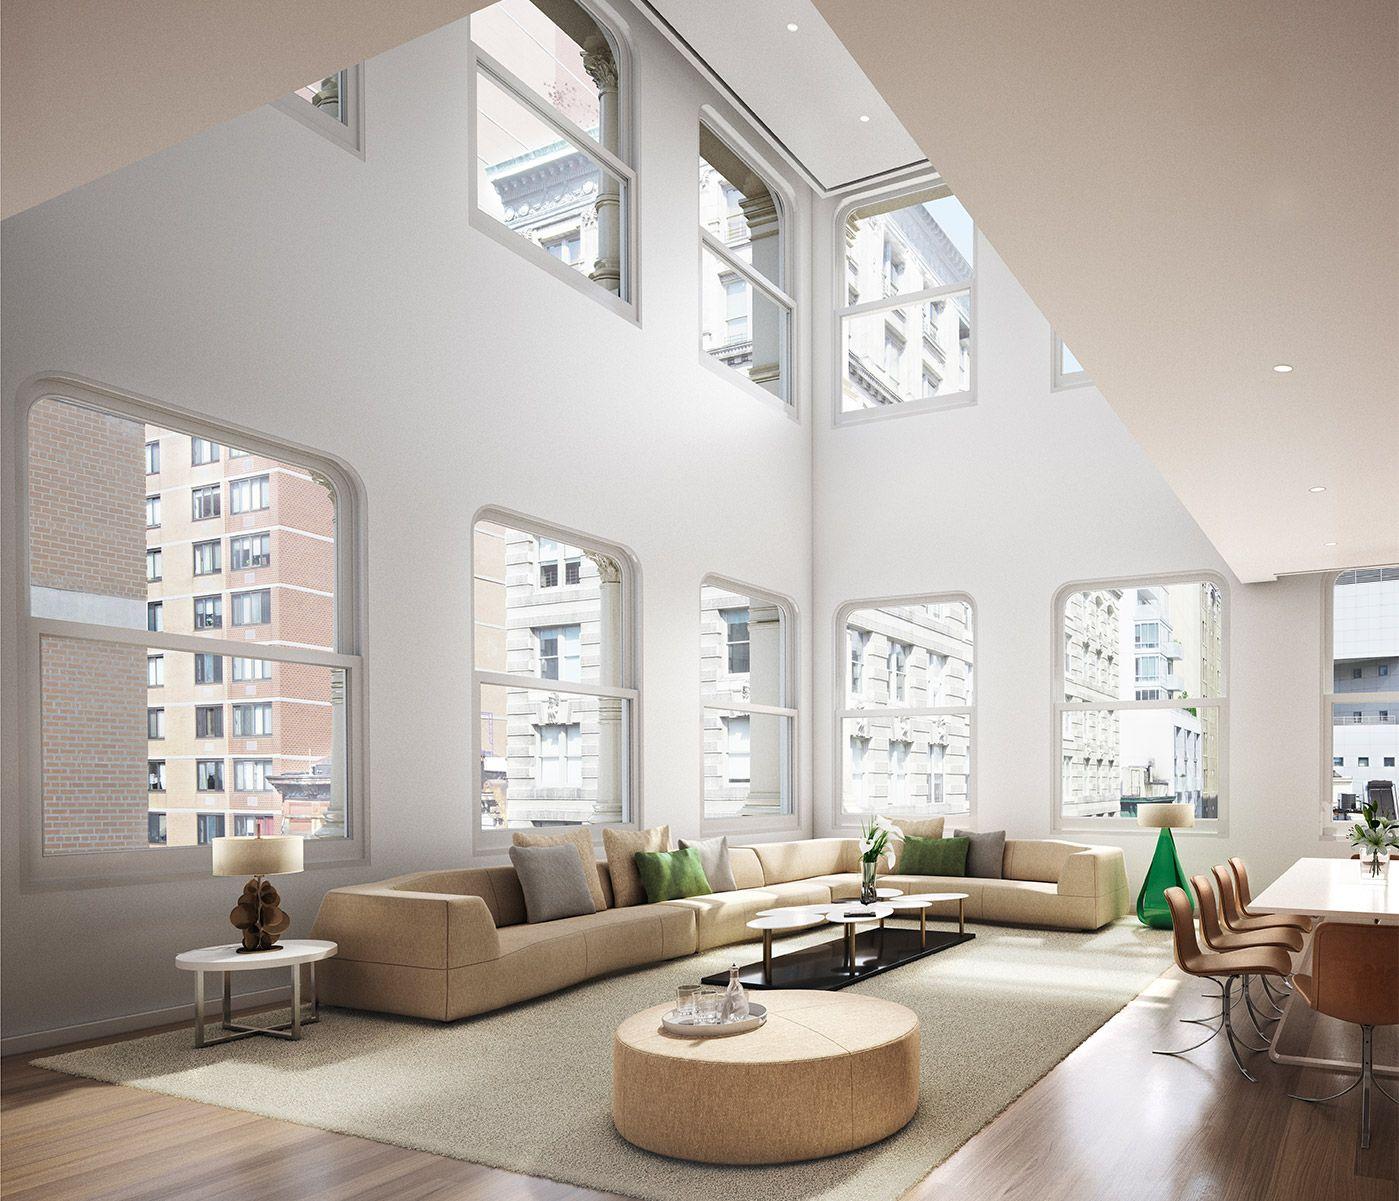 Shigeru Ban Redesigns Interiors For Iron Clad New York Apartment Block